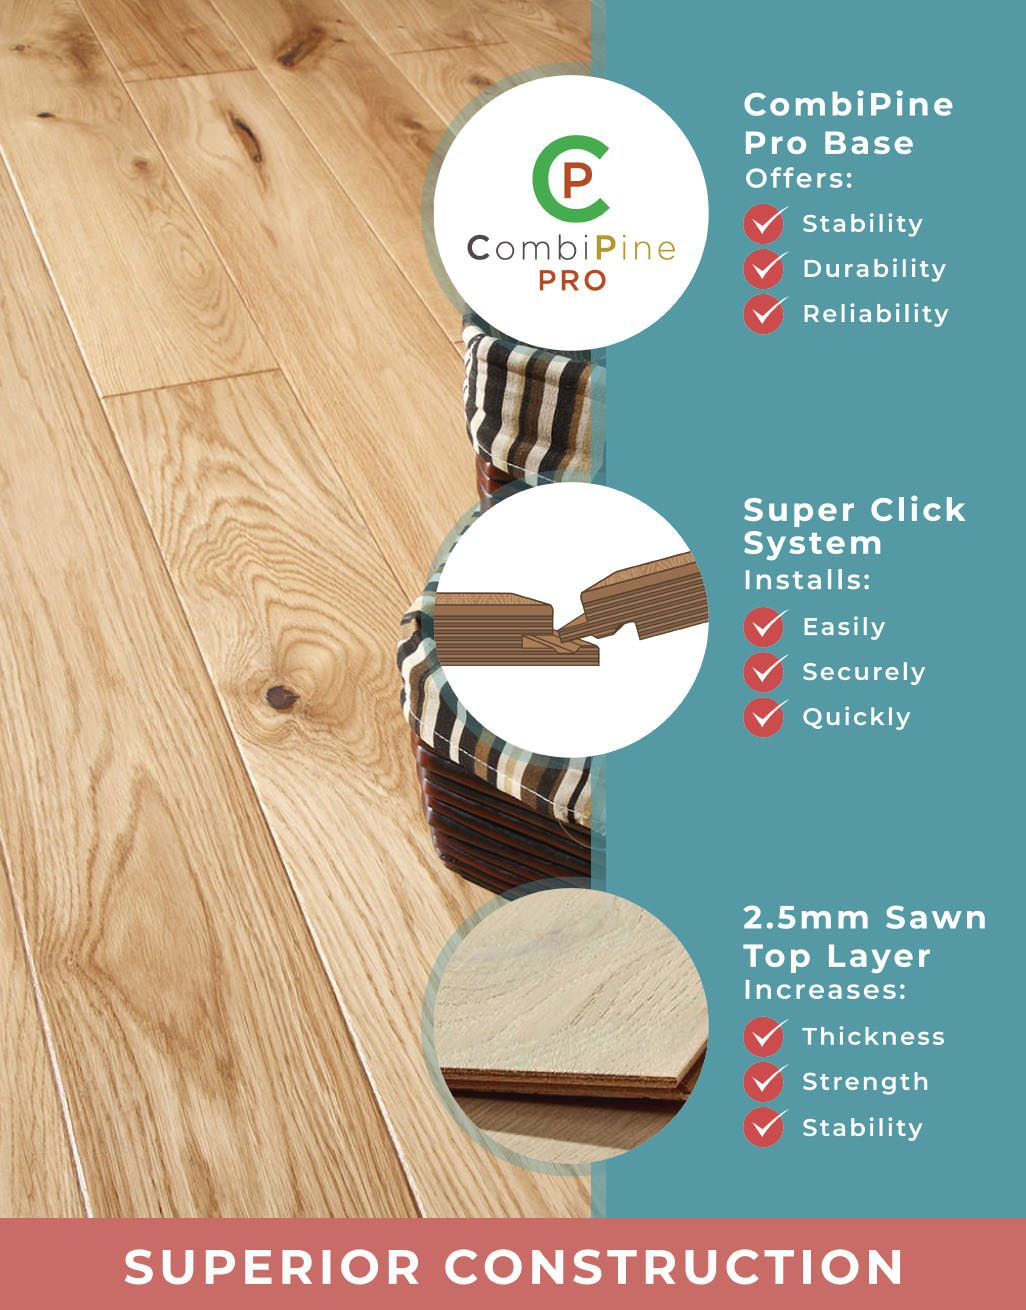 Direct Wood Flooring, 14mm Thick Laminate Flooring